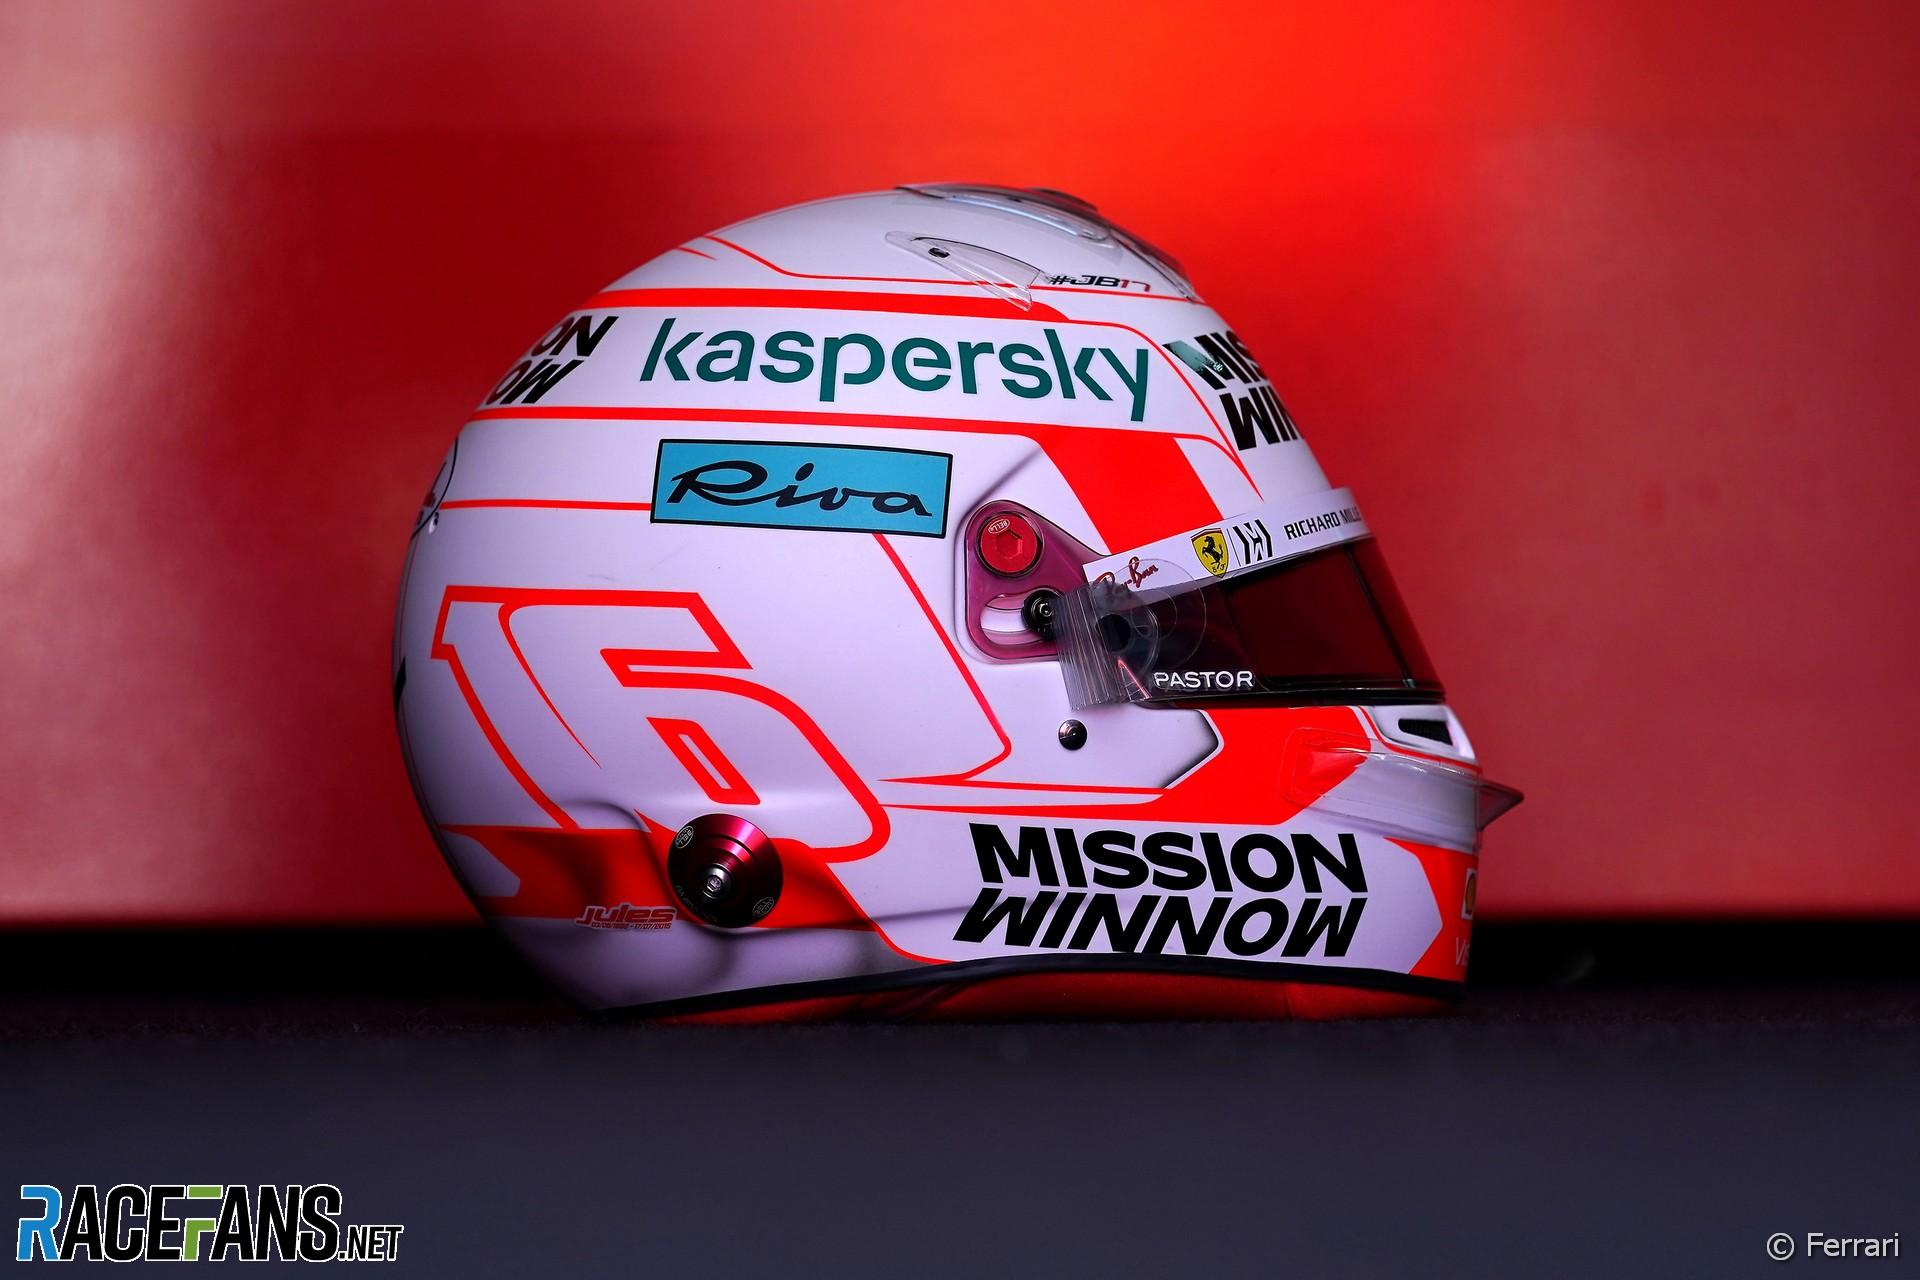 Charles Leclerc's Portuguese Grand Prix helmet, Algarve, 2021